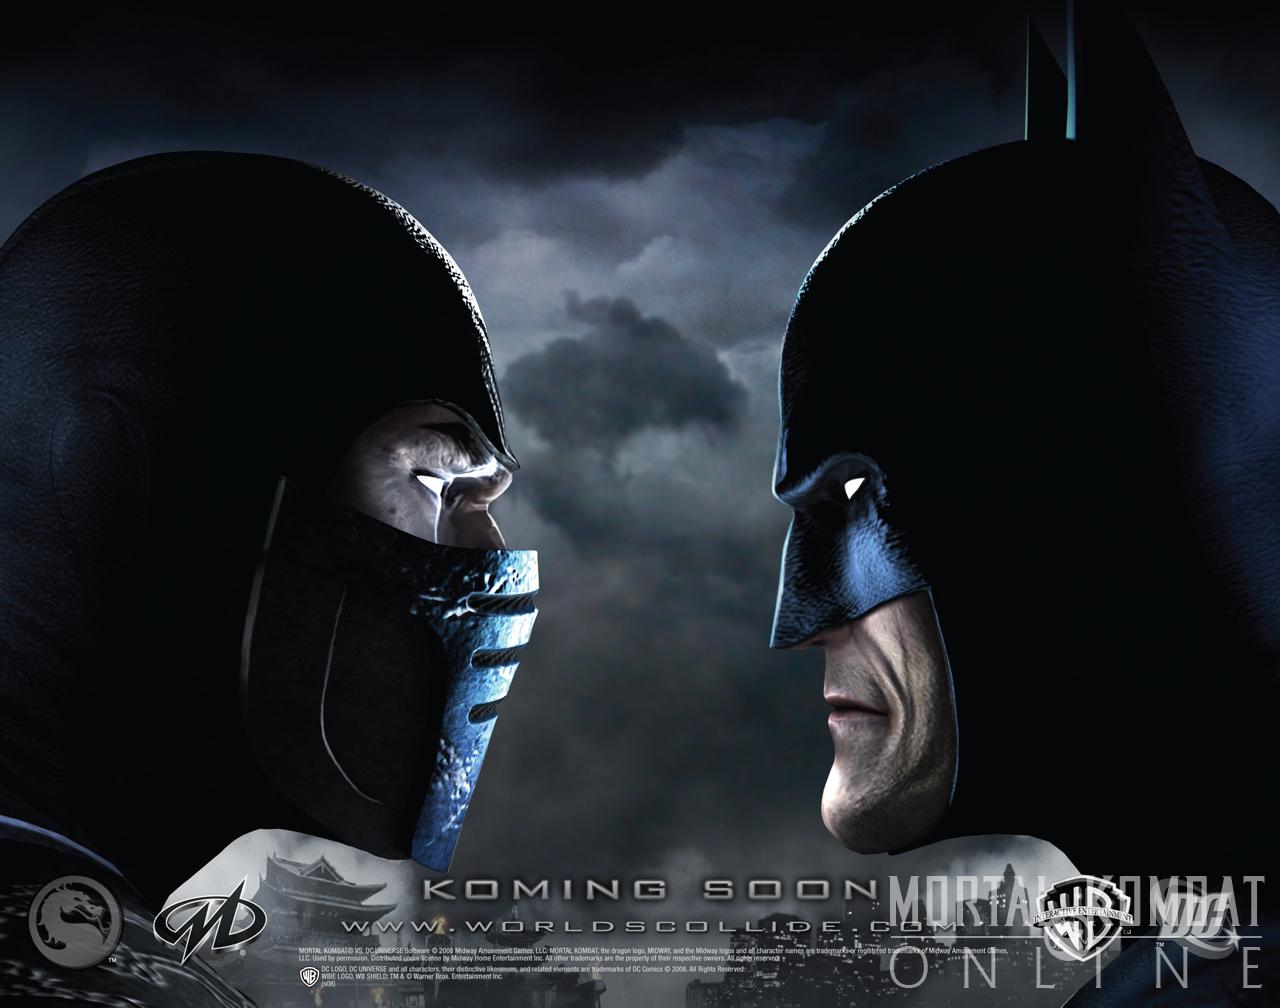 Mortal Kombat Creator Ed Boon Video Interview About Mortal Kombat